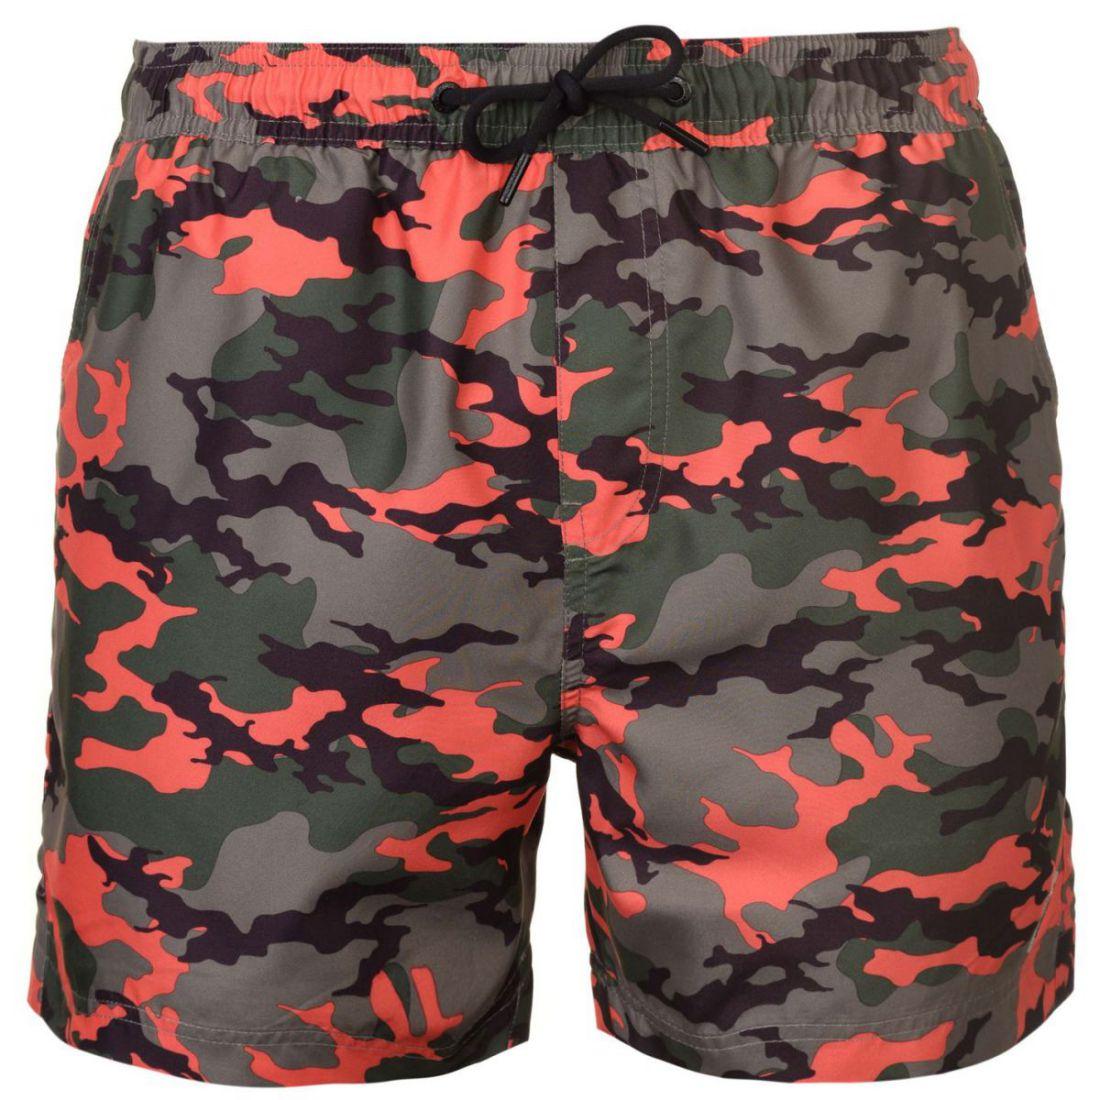 Pierre Cardin Mens Camo Swim Shorts Pants Trousers Bottoms ... 6be2db688